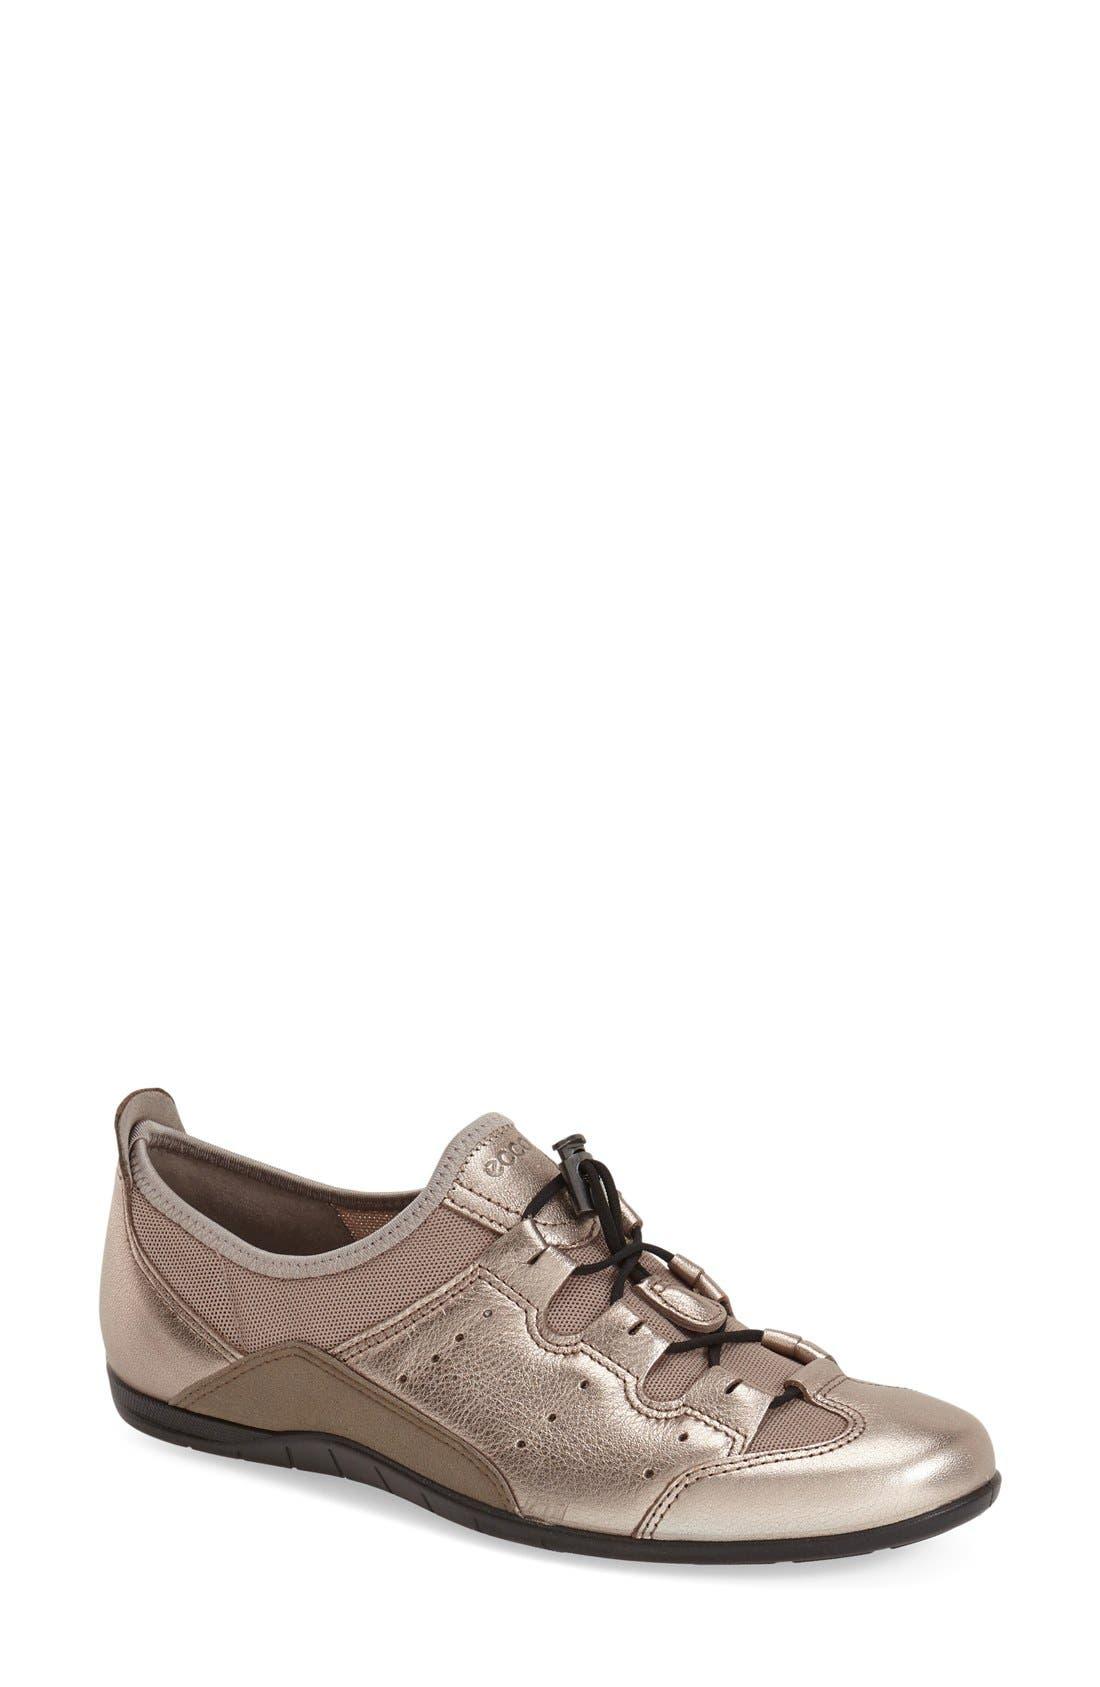 'Bluma' Sneaker,                             Main thumbnail 1, color,                             Grey Leather Fabric